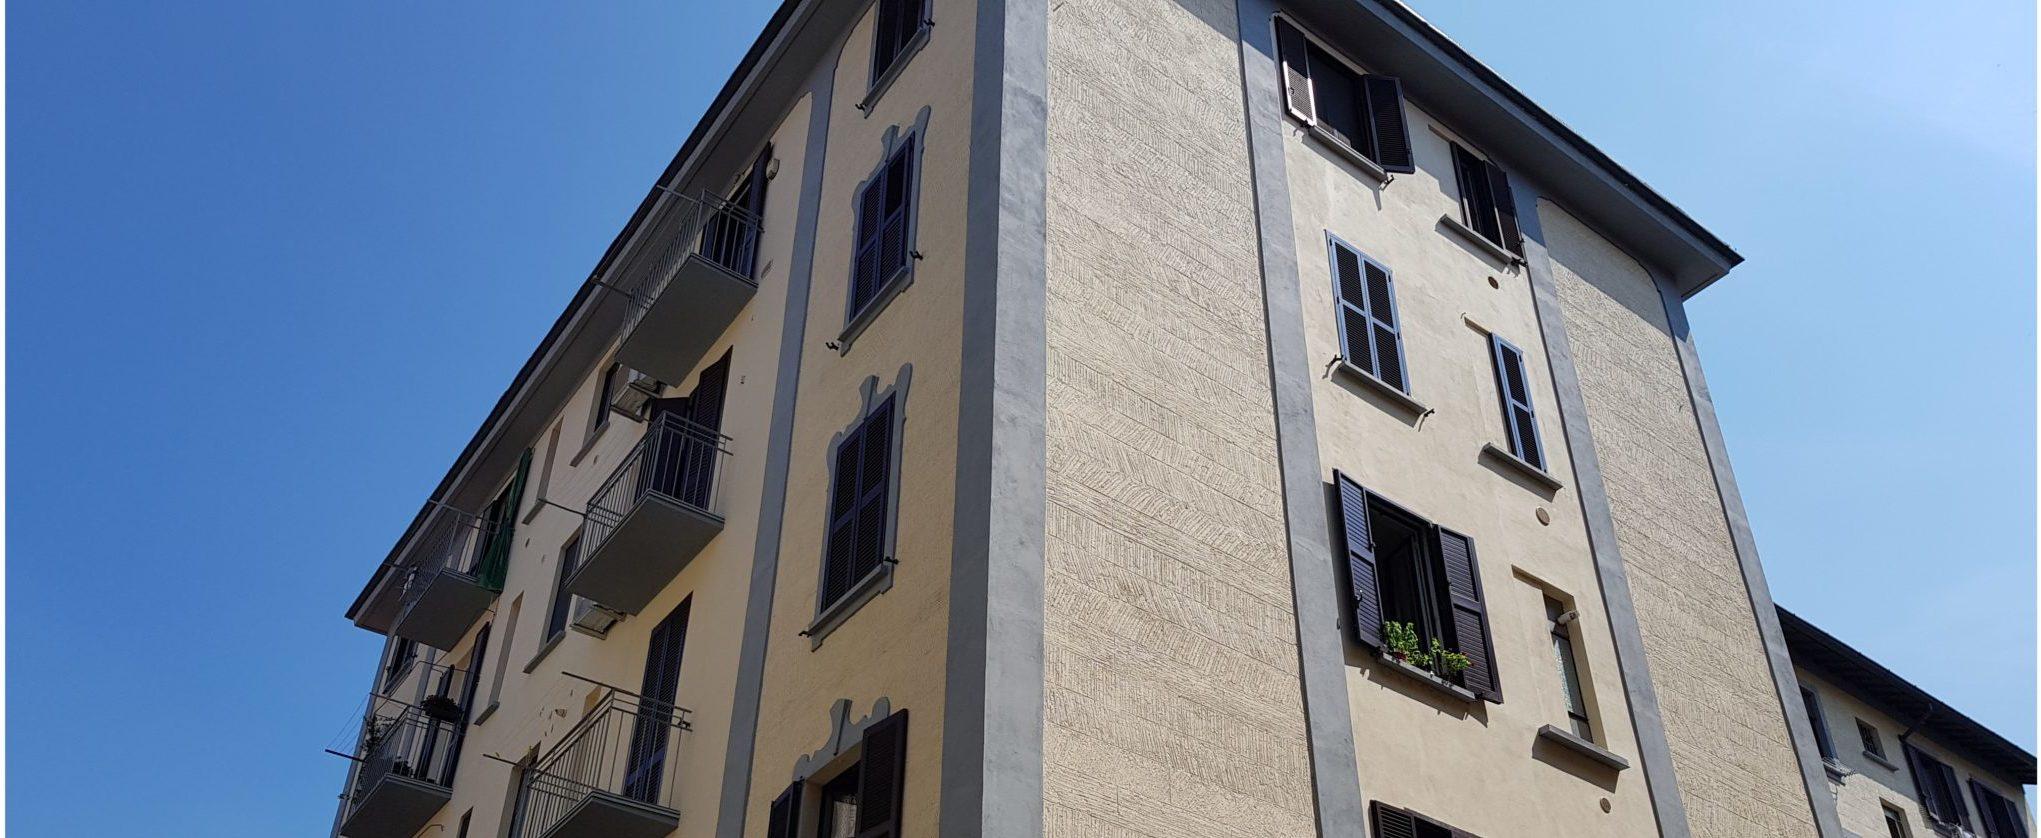 Bilocale Pomponazzi, zona Bocconi